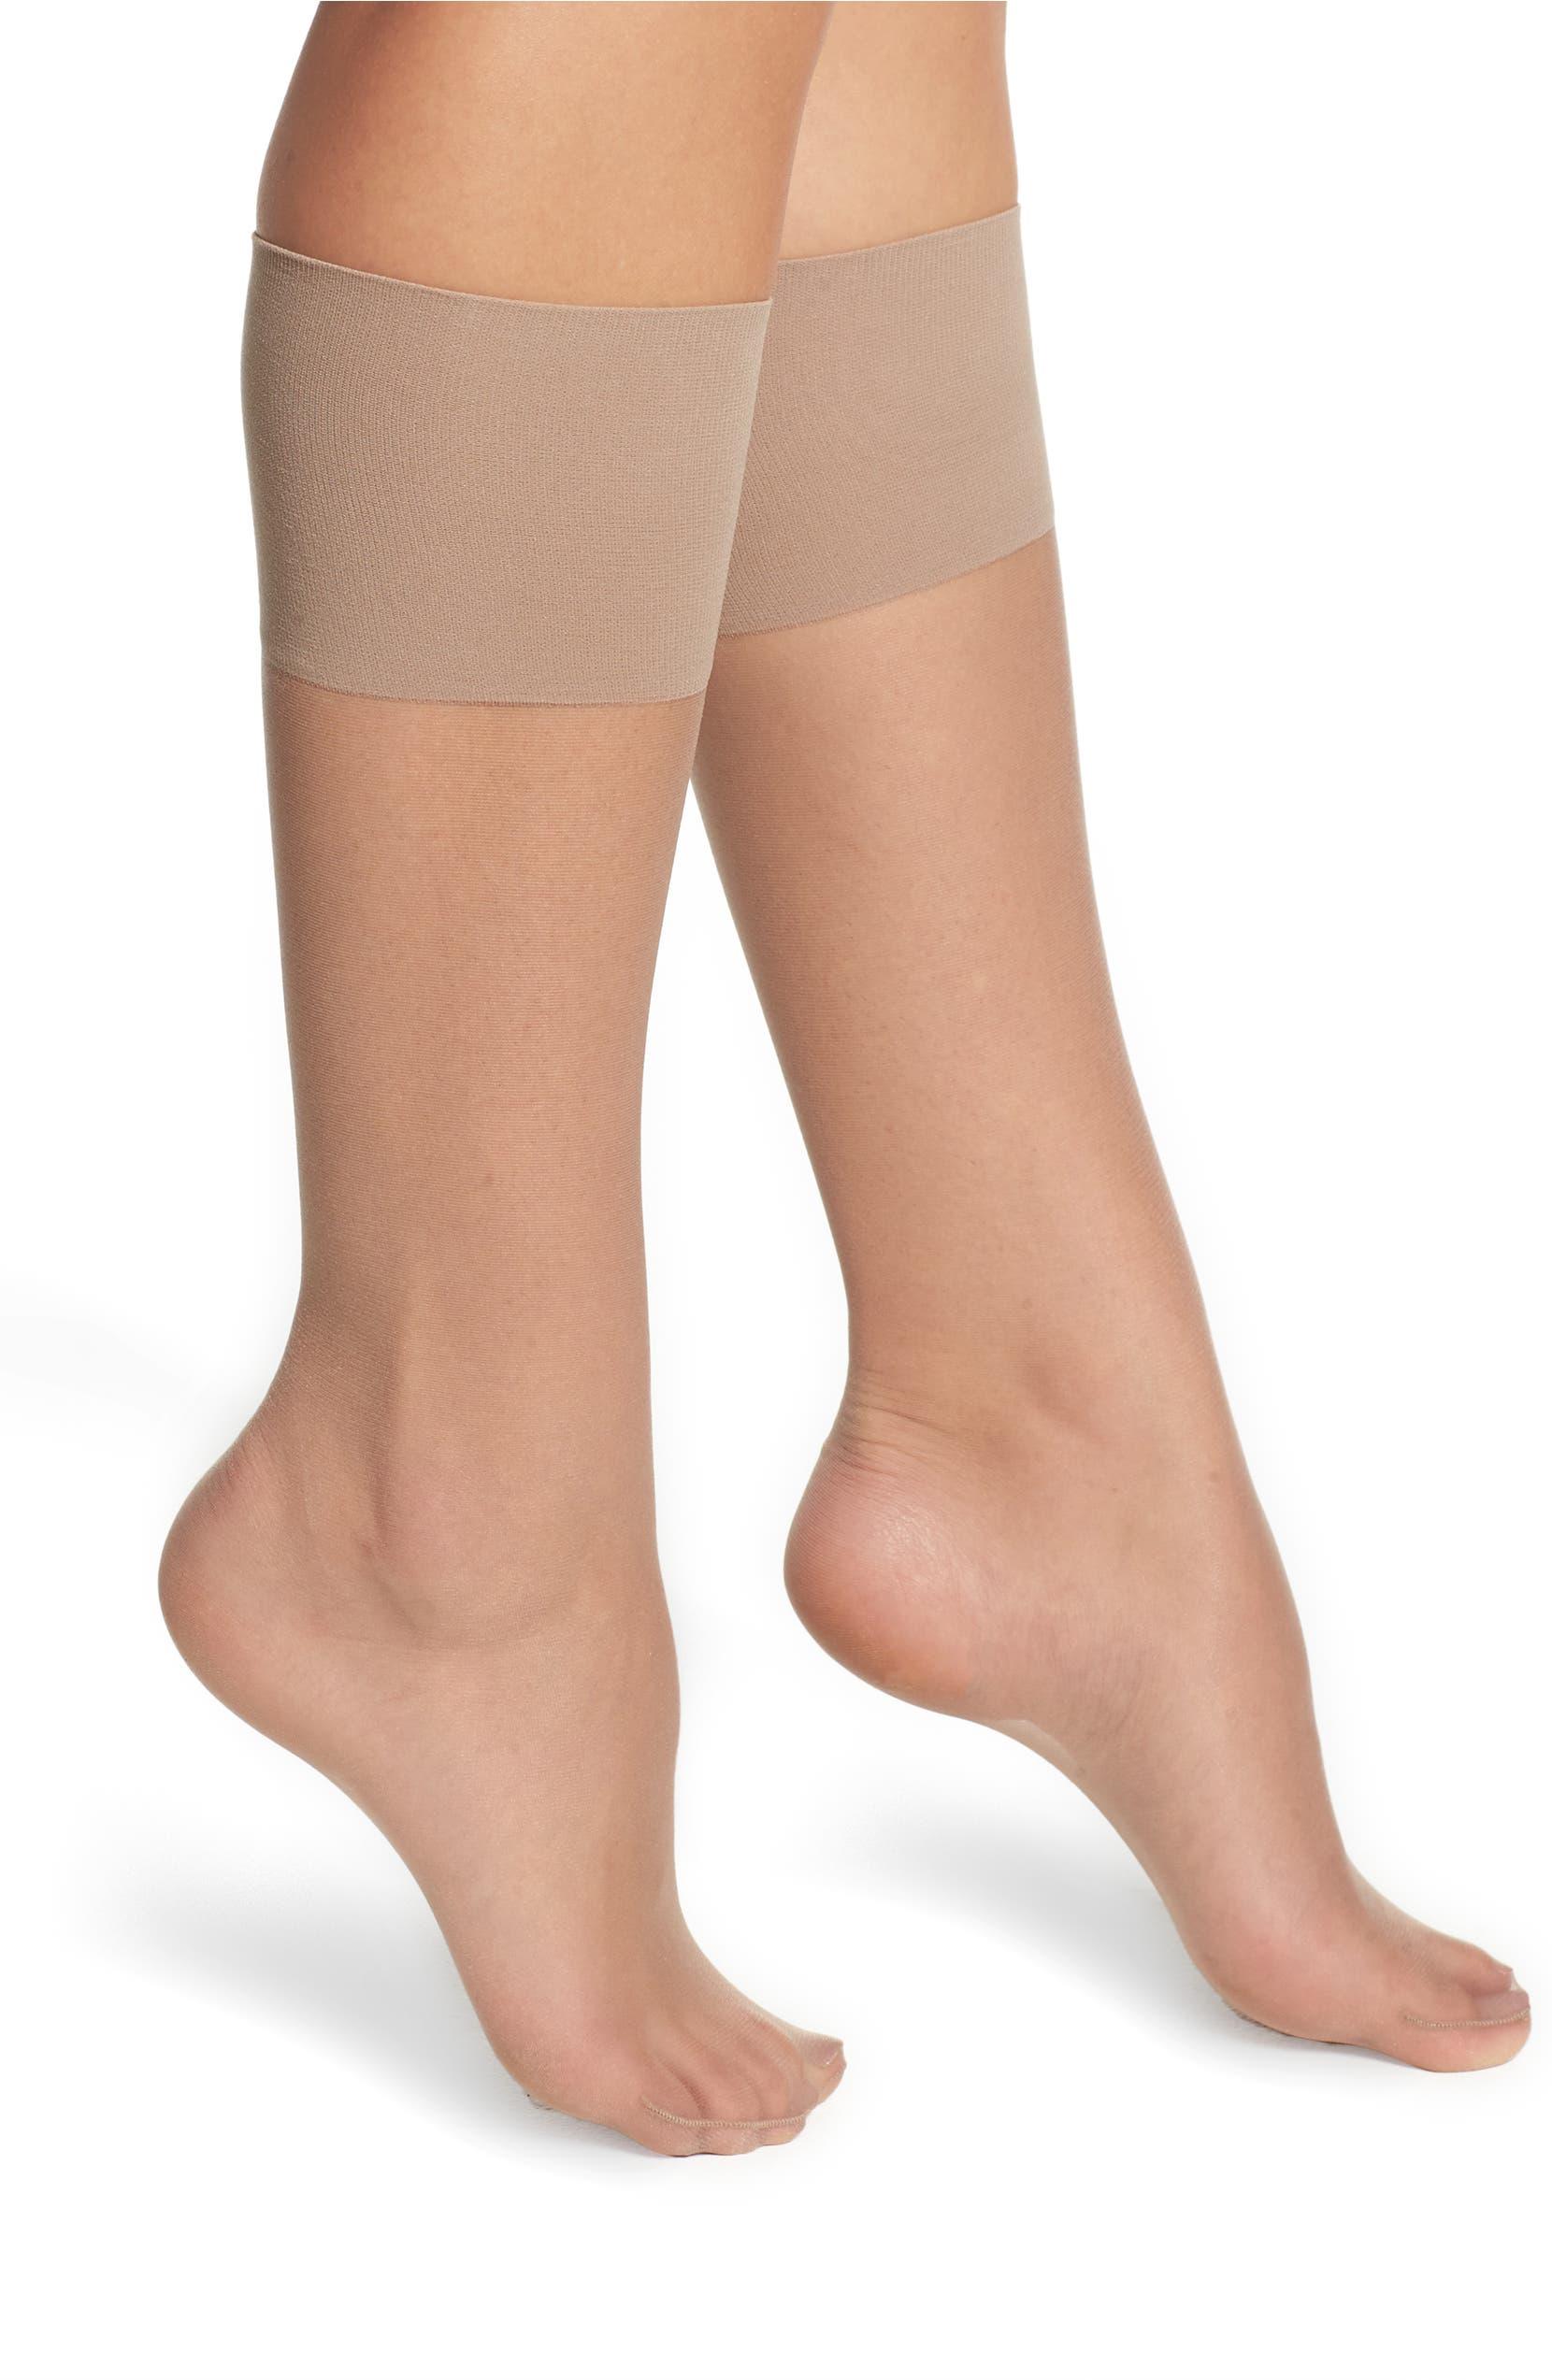 75847064d Nordstrom 2-Pack Naked Sheer Knee Highs (3 for  36)